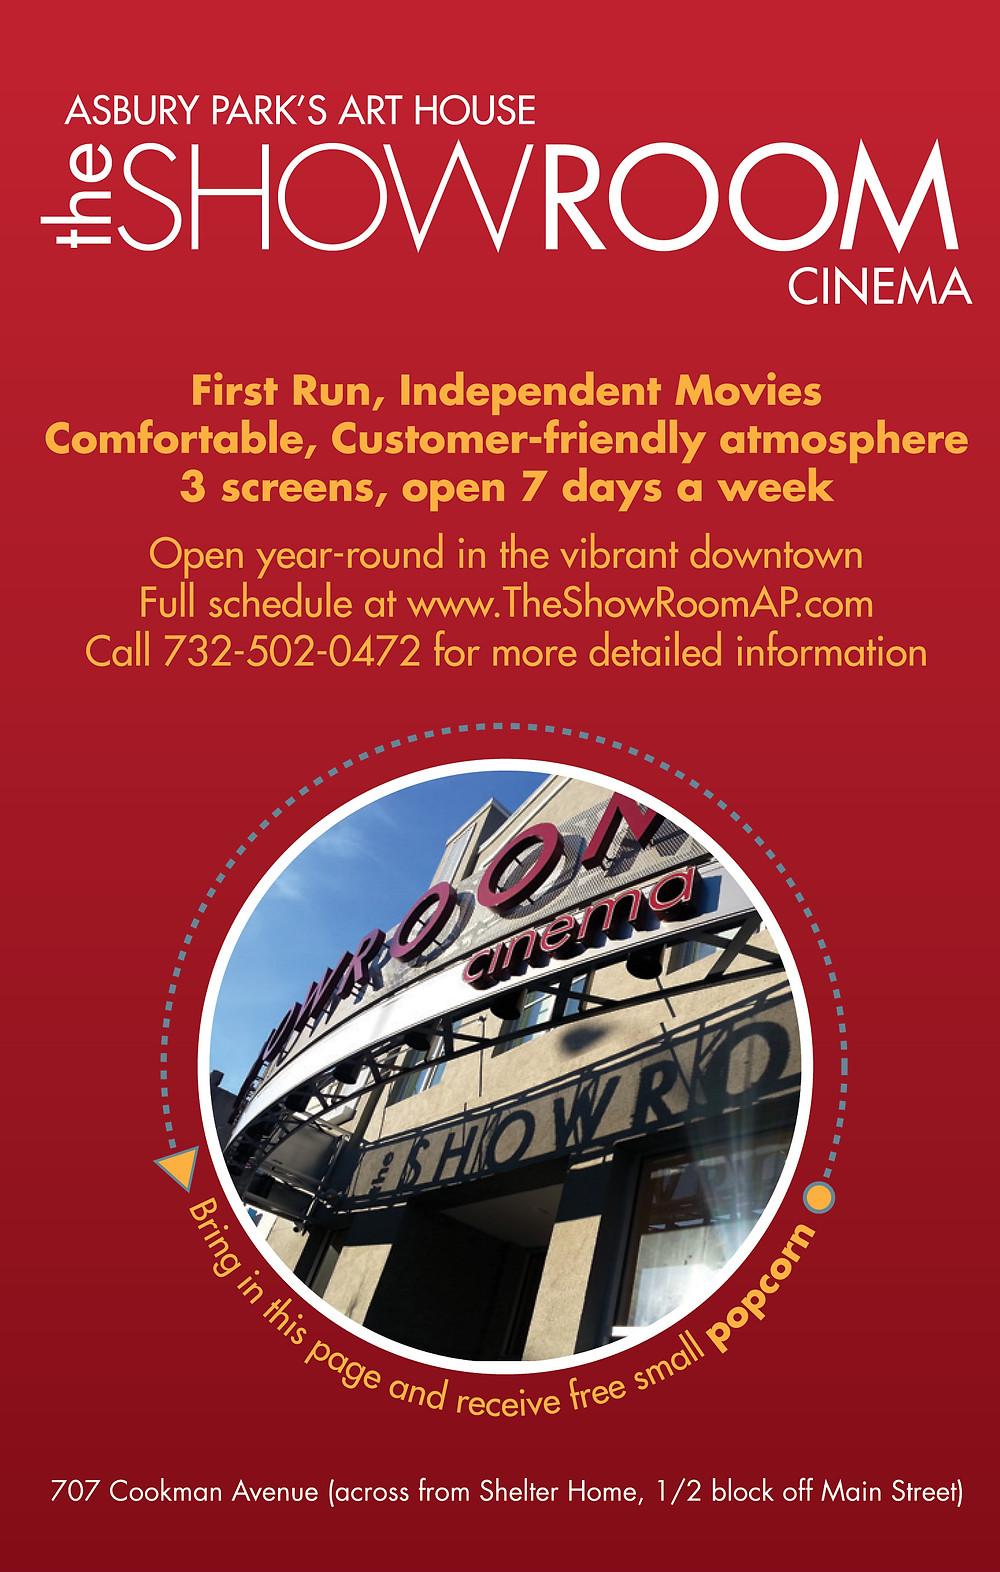 Showroom Cinema Asbury Park